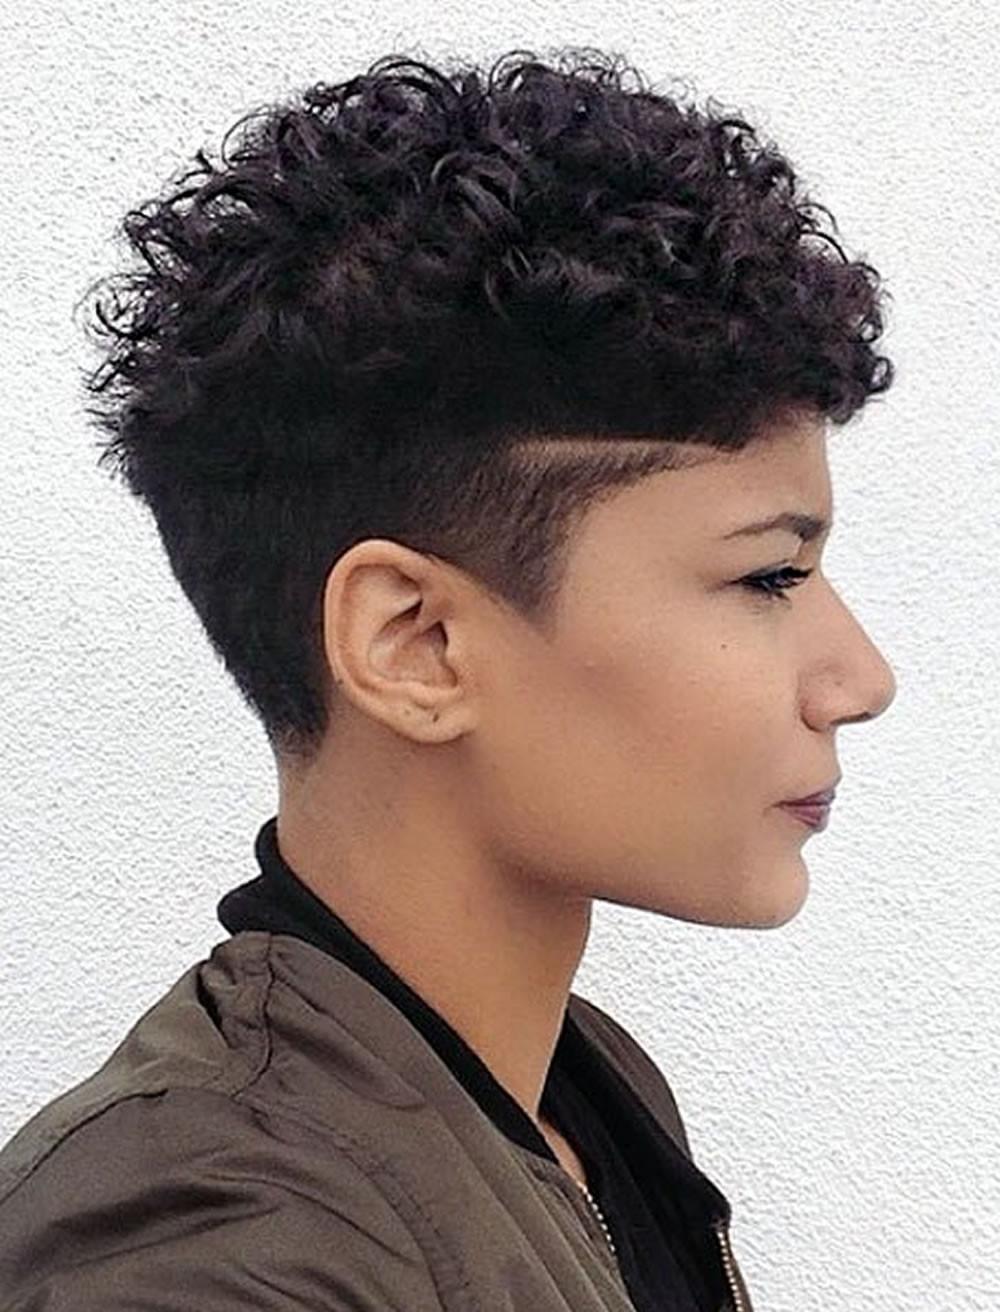 Undercut Hairstyles For Black Women  Undercut Short Hairstyles for Black Women & Which e